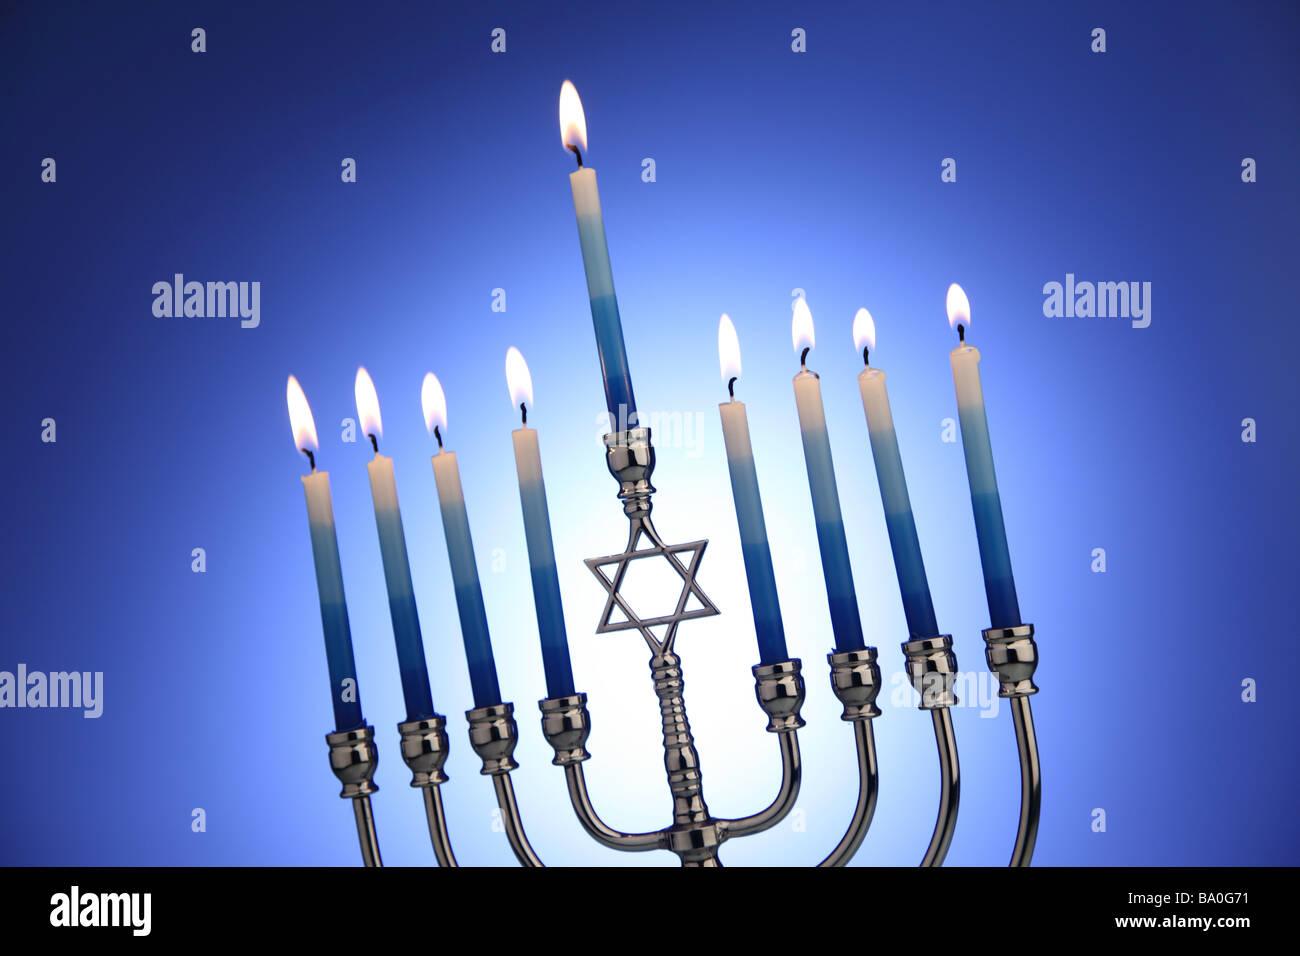 Jewish Hanukkah Menorah with blue background - Stock Image